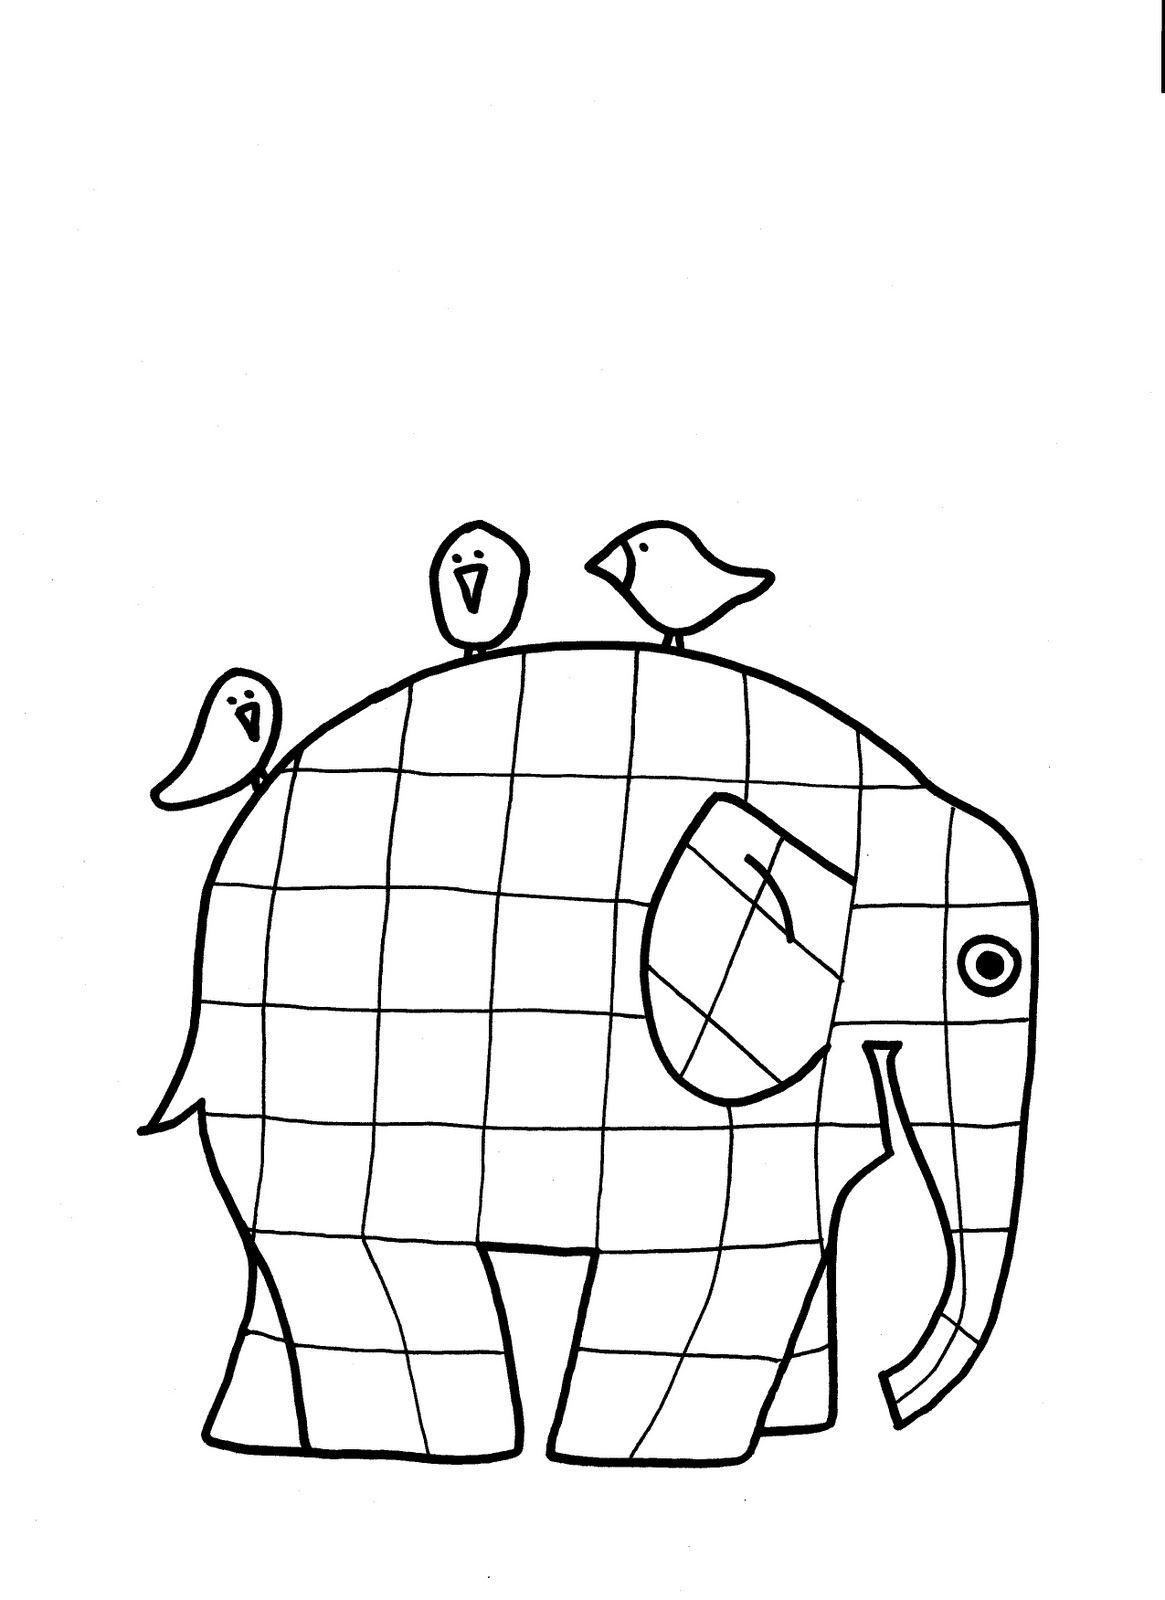 Elmer coloring page | Histórias | Pinterest | Elmar, Bilderbücher ...